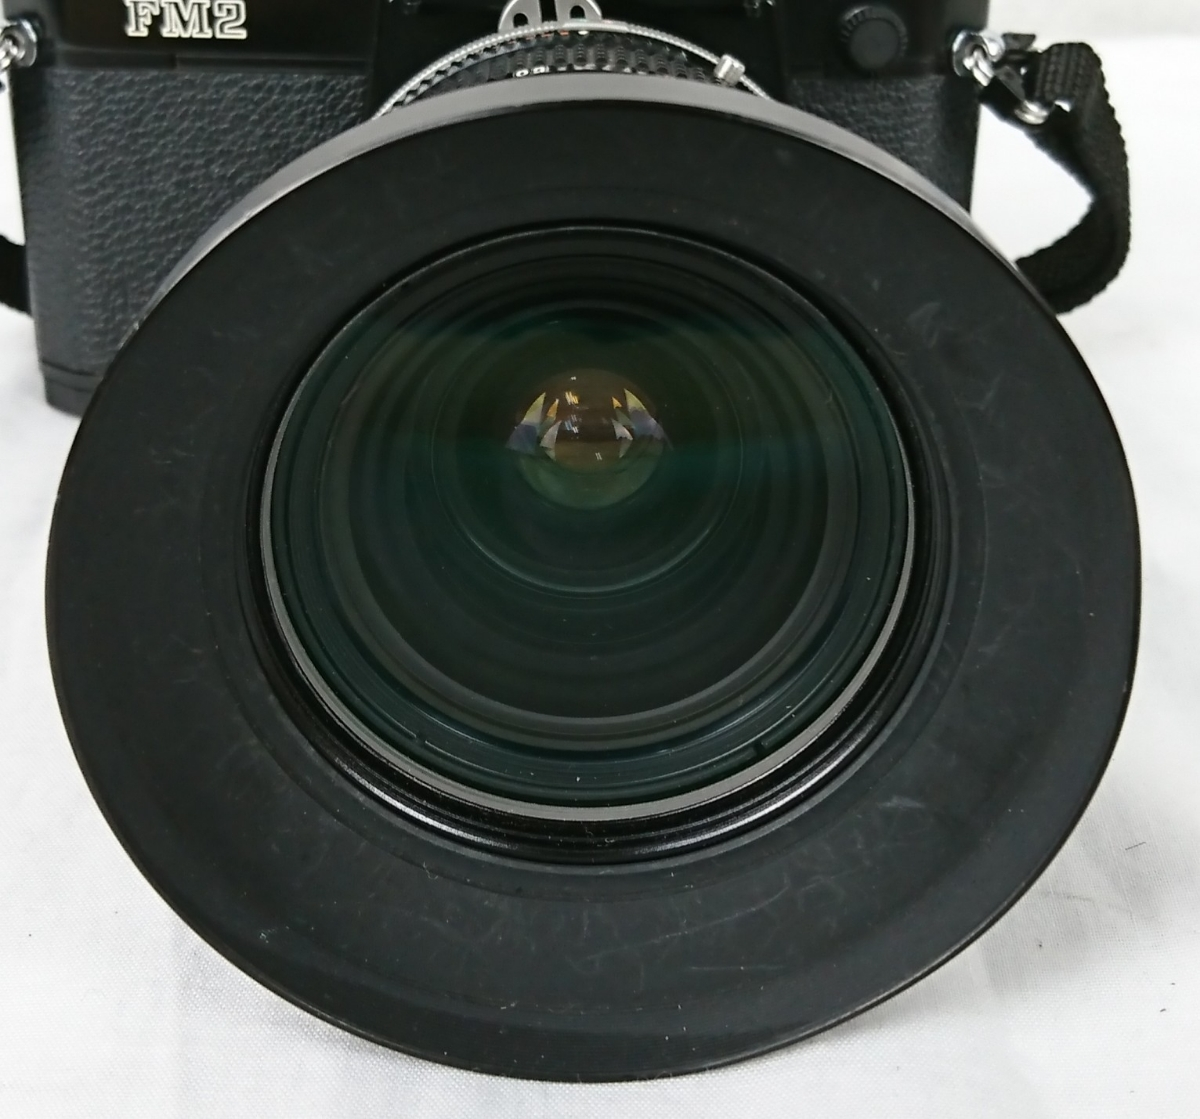 【GK-201】 Nikon ニコン カメラ FM2 レンズ Zoom-NIKKOR 28~85mm 1:3.5~4.5 黒色 black ブラックボディー N7763716 MFカメラ _画像2